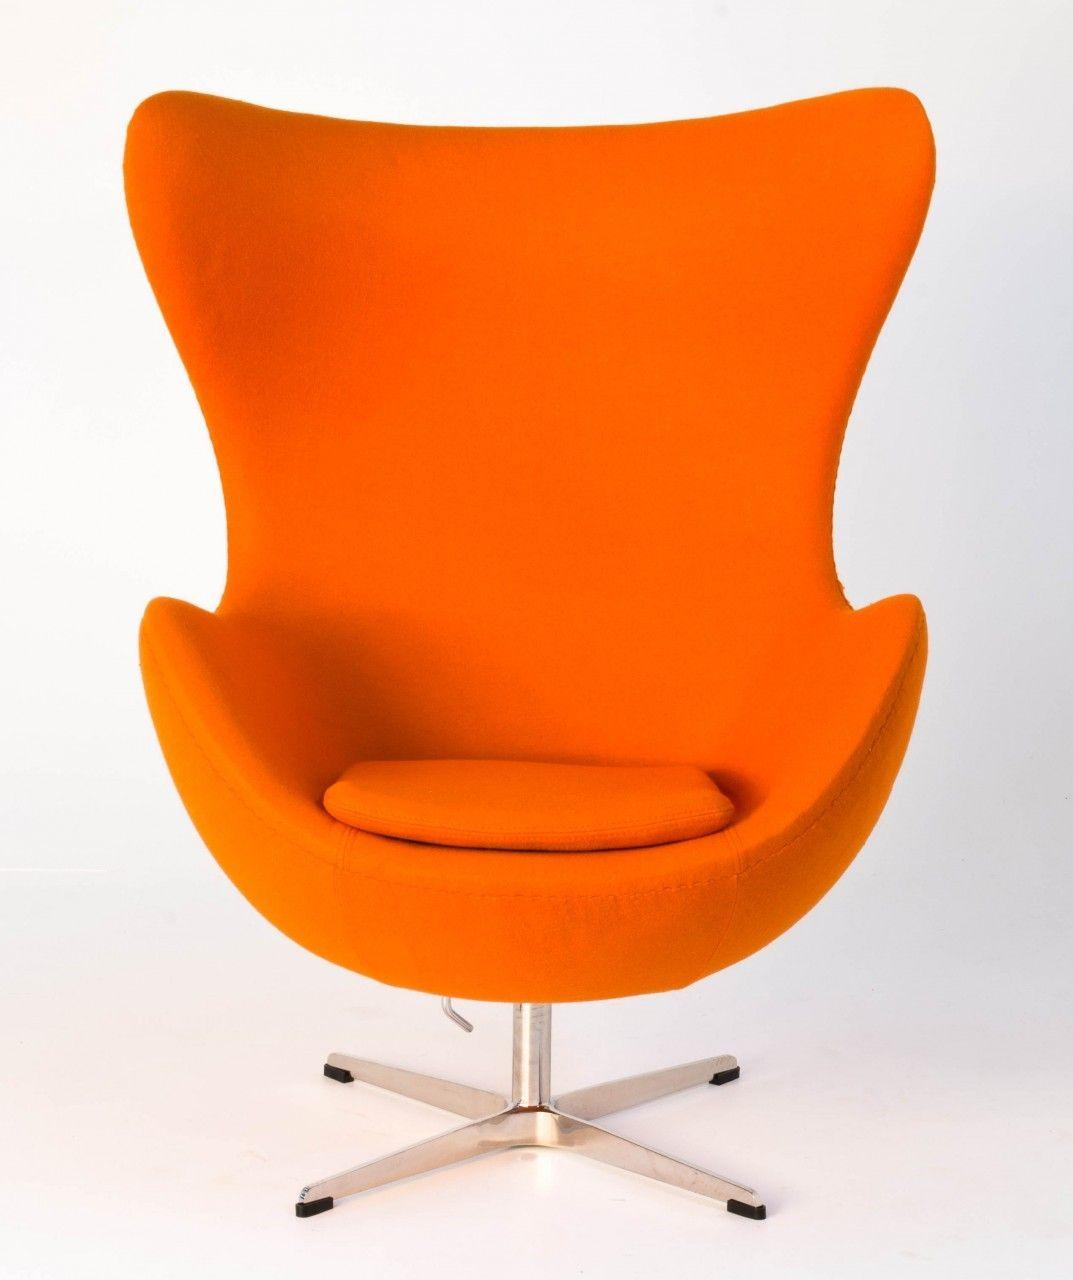 Classics designers arne jacobsen egg chair replica in cowhide - Replica Egg Chair Orange